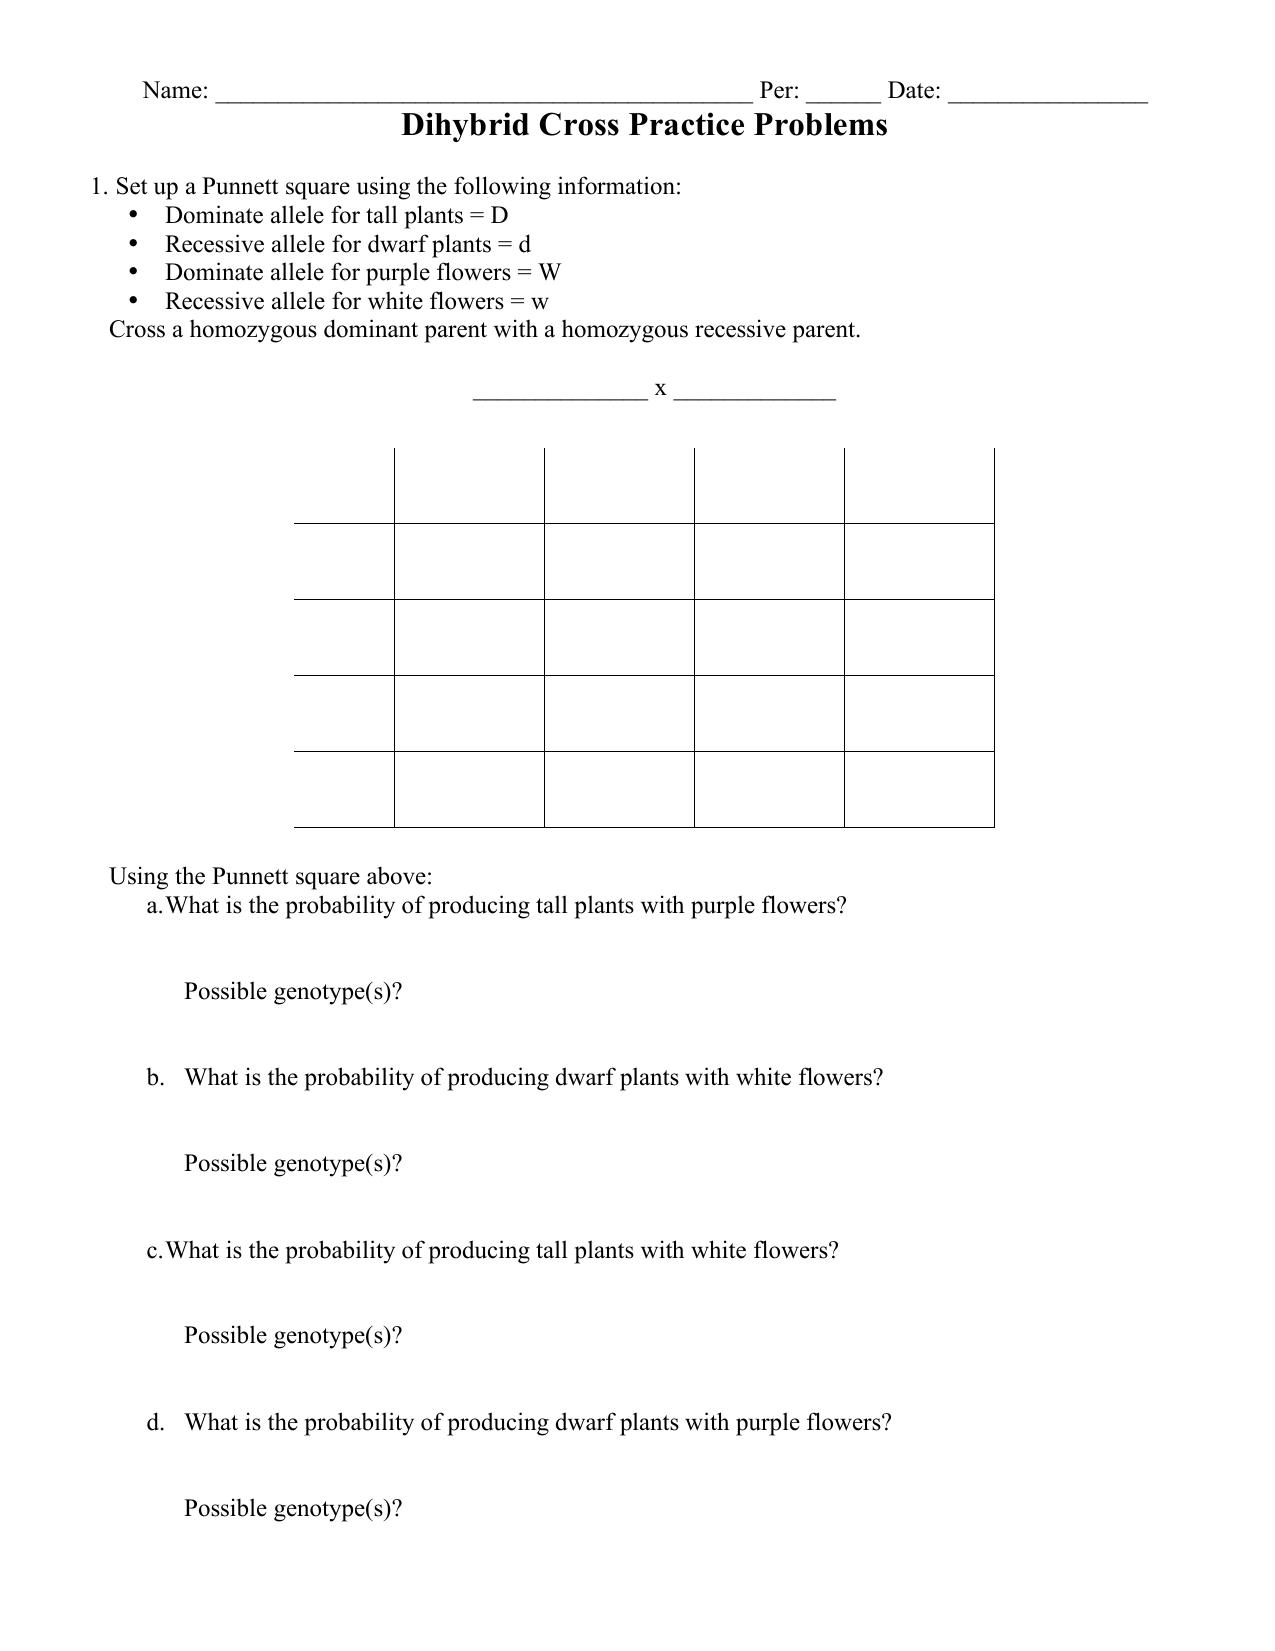 Dihybrid Cross Practice Problems